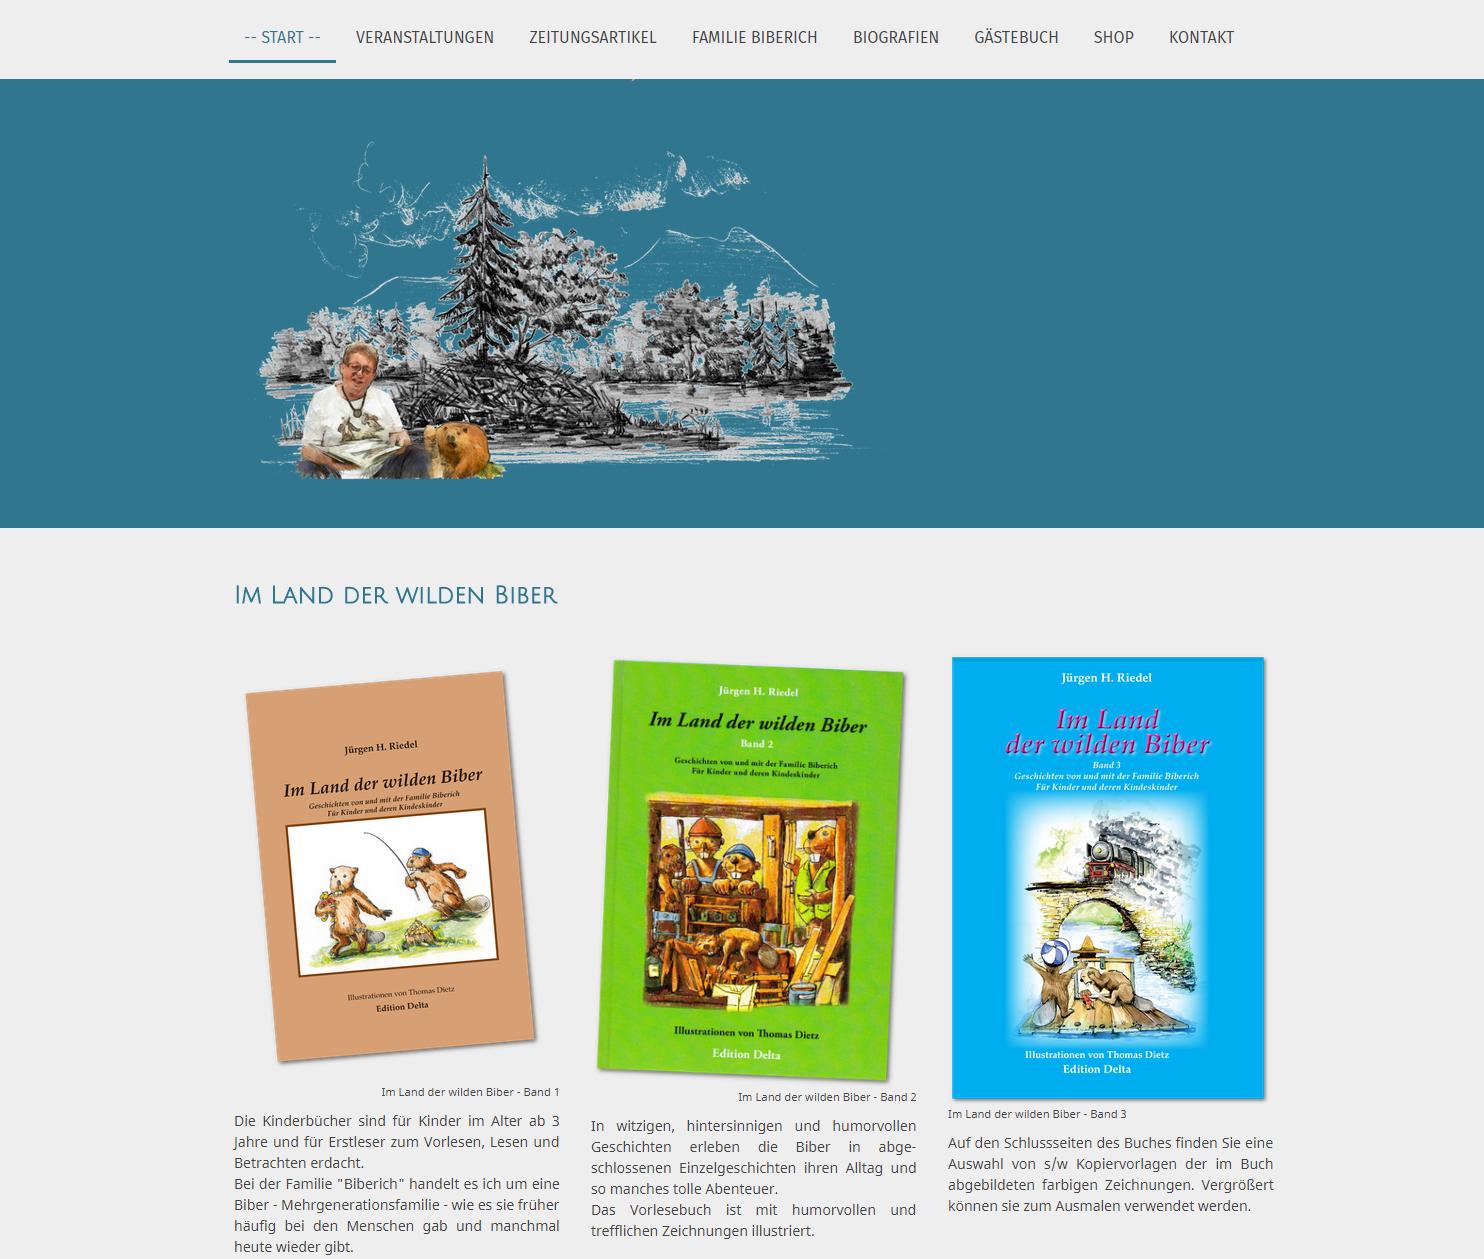 Kinderbuchautor Jürgen H. Riedel: www.wilde-biber.de